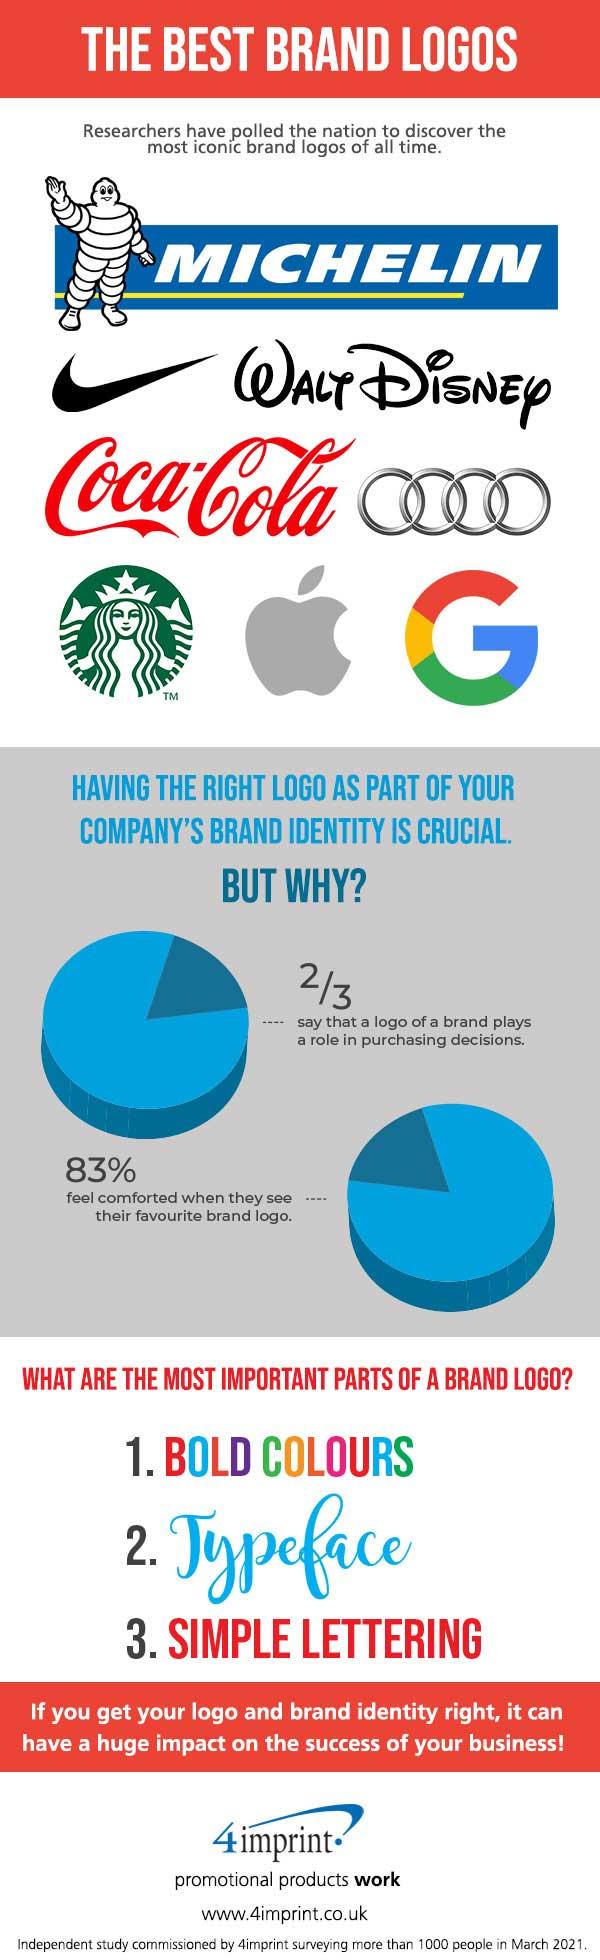 Best-brand-logos-infographic